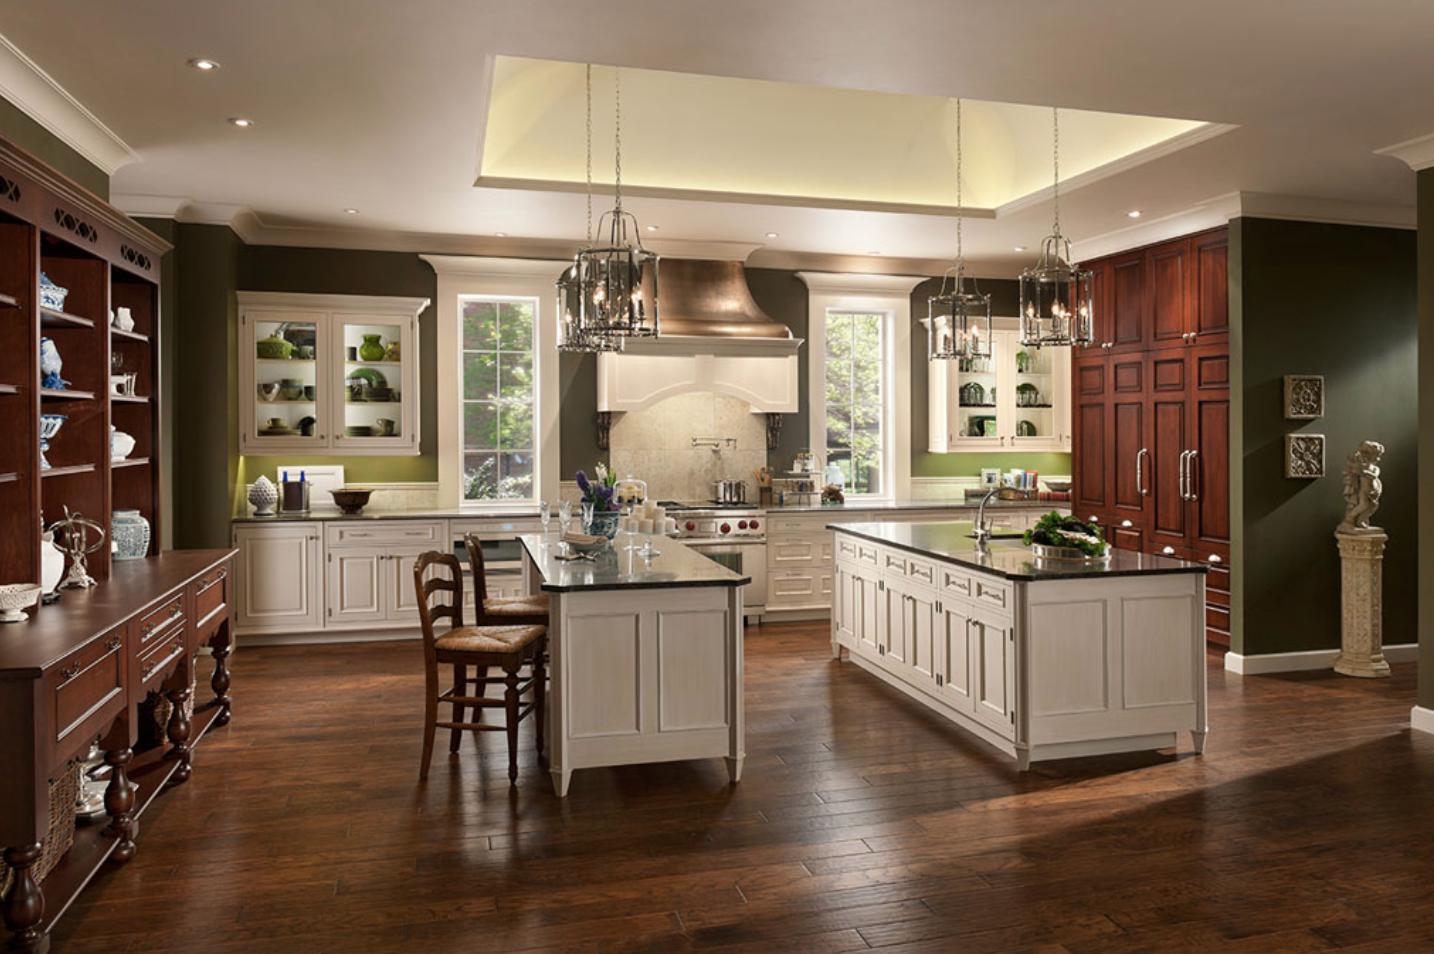 Reminder Brookhaven Essentials Sale Ends June 2019 Kitchen Design Kitchen Cabinet Design Kitchen Remodel